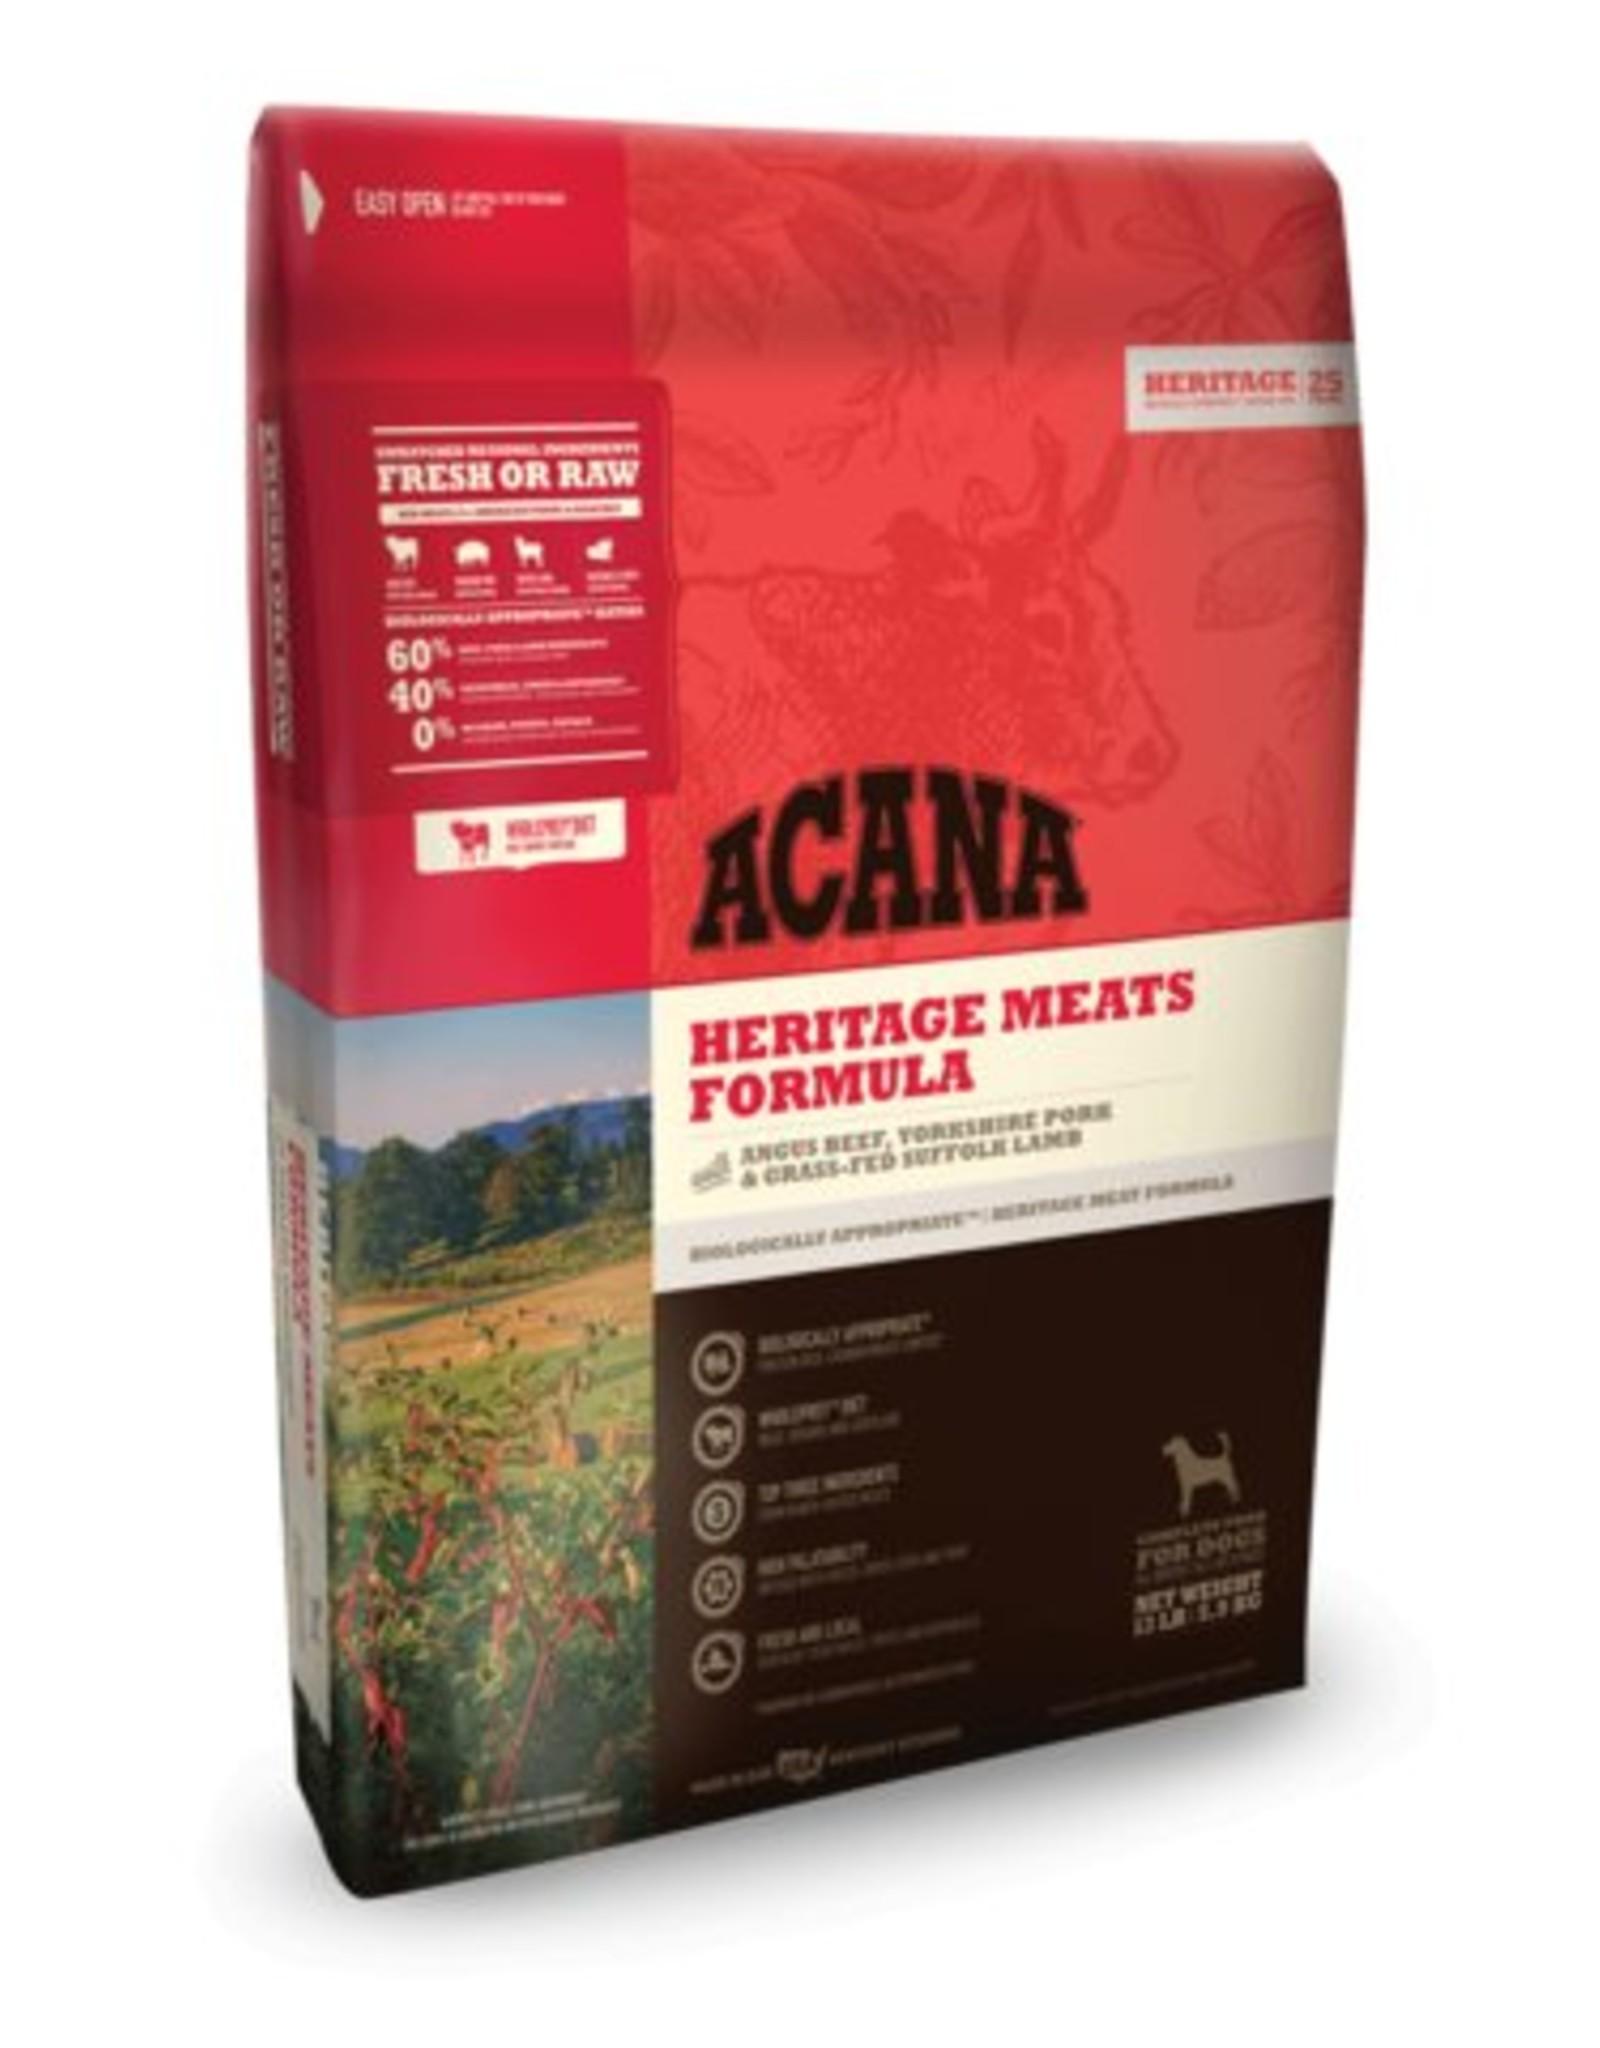 Acana Heritage Meats Formula Grain-Free Dog Food